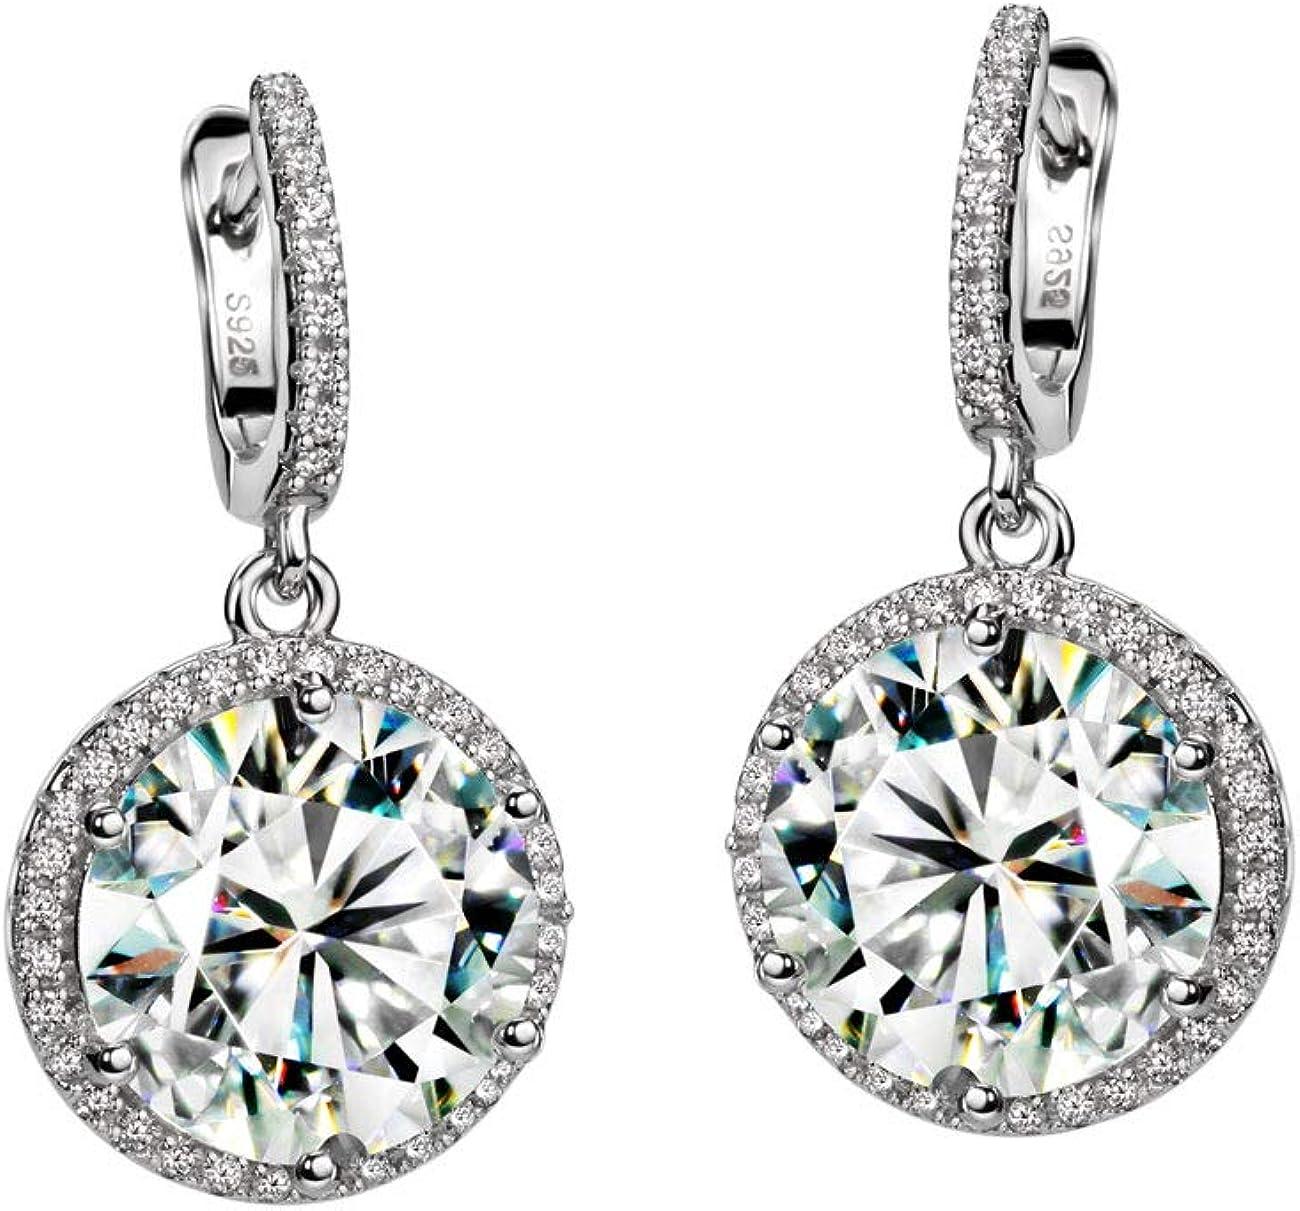 Michooyel S925 Max 55% OFF 4ct Diamond Dangle Excellent E Earrings Halo Cubic Zirconia